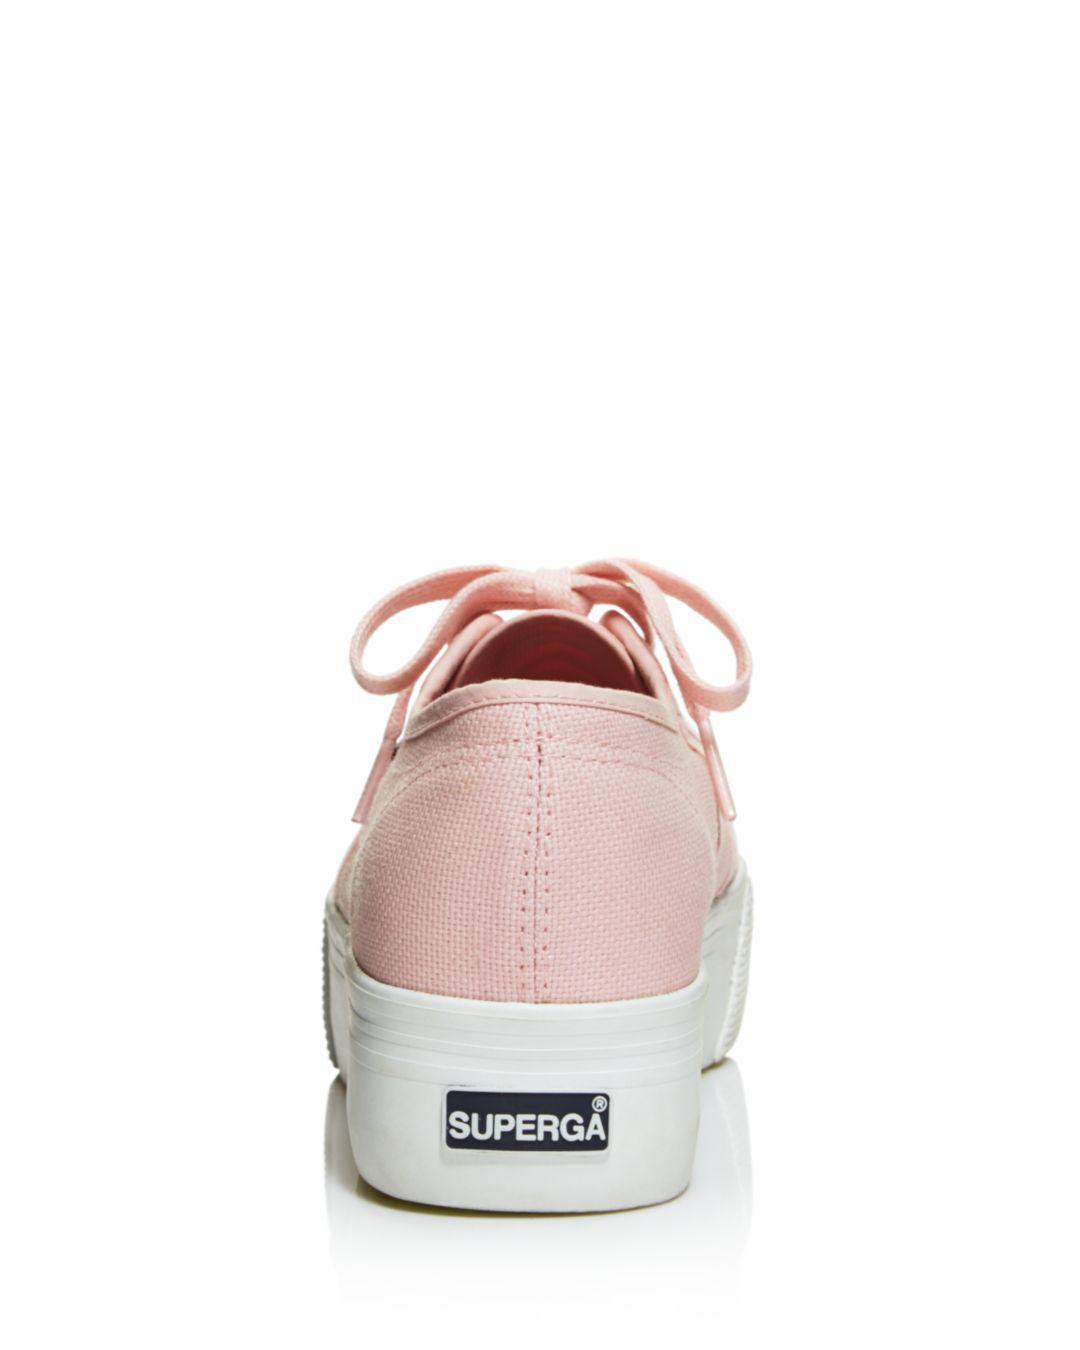 Superga Women's Coloreycotw Multicolor Eyelet Lace Up Platform Sneakers in Vintage Pink (Pink)